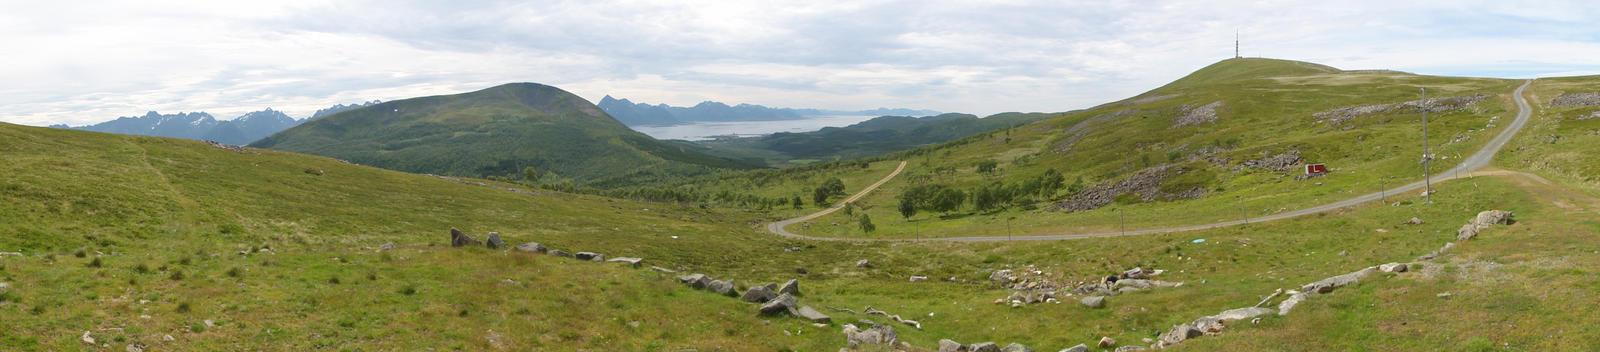 Pamorama Over Hadseloeya by ChimeraDragonfang